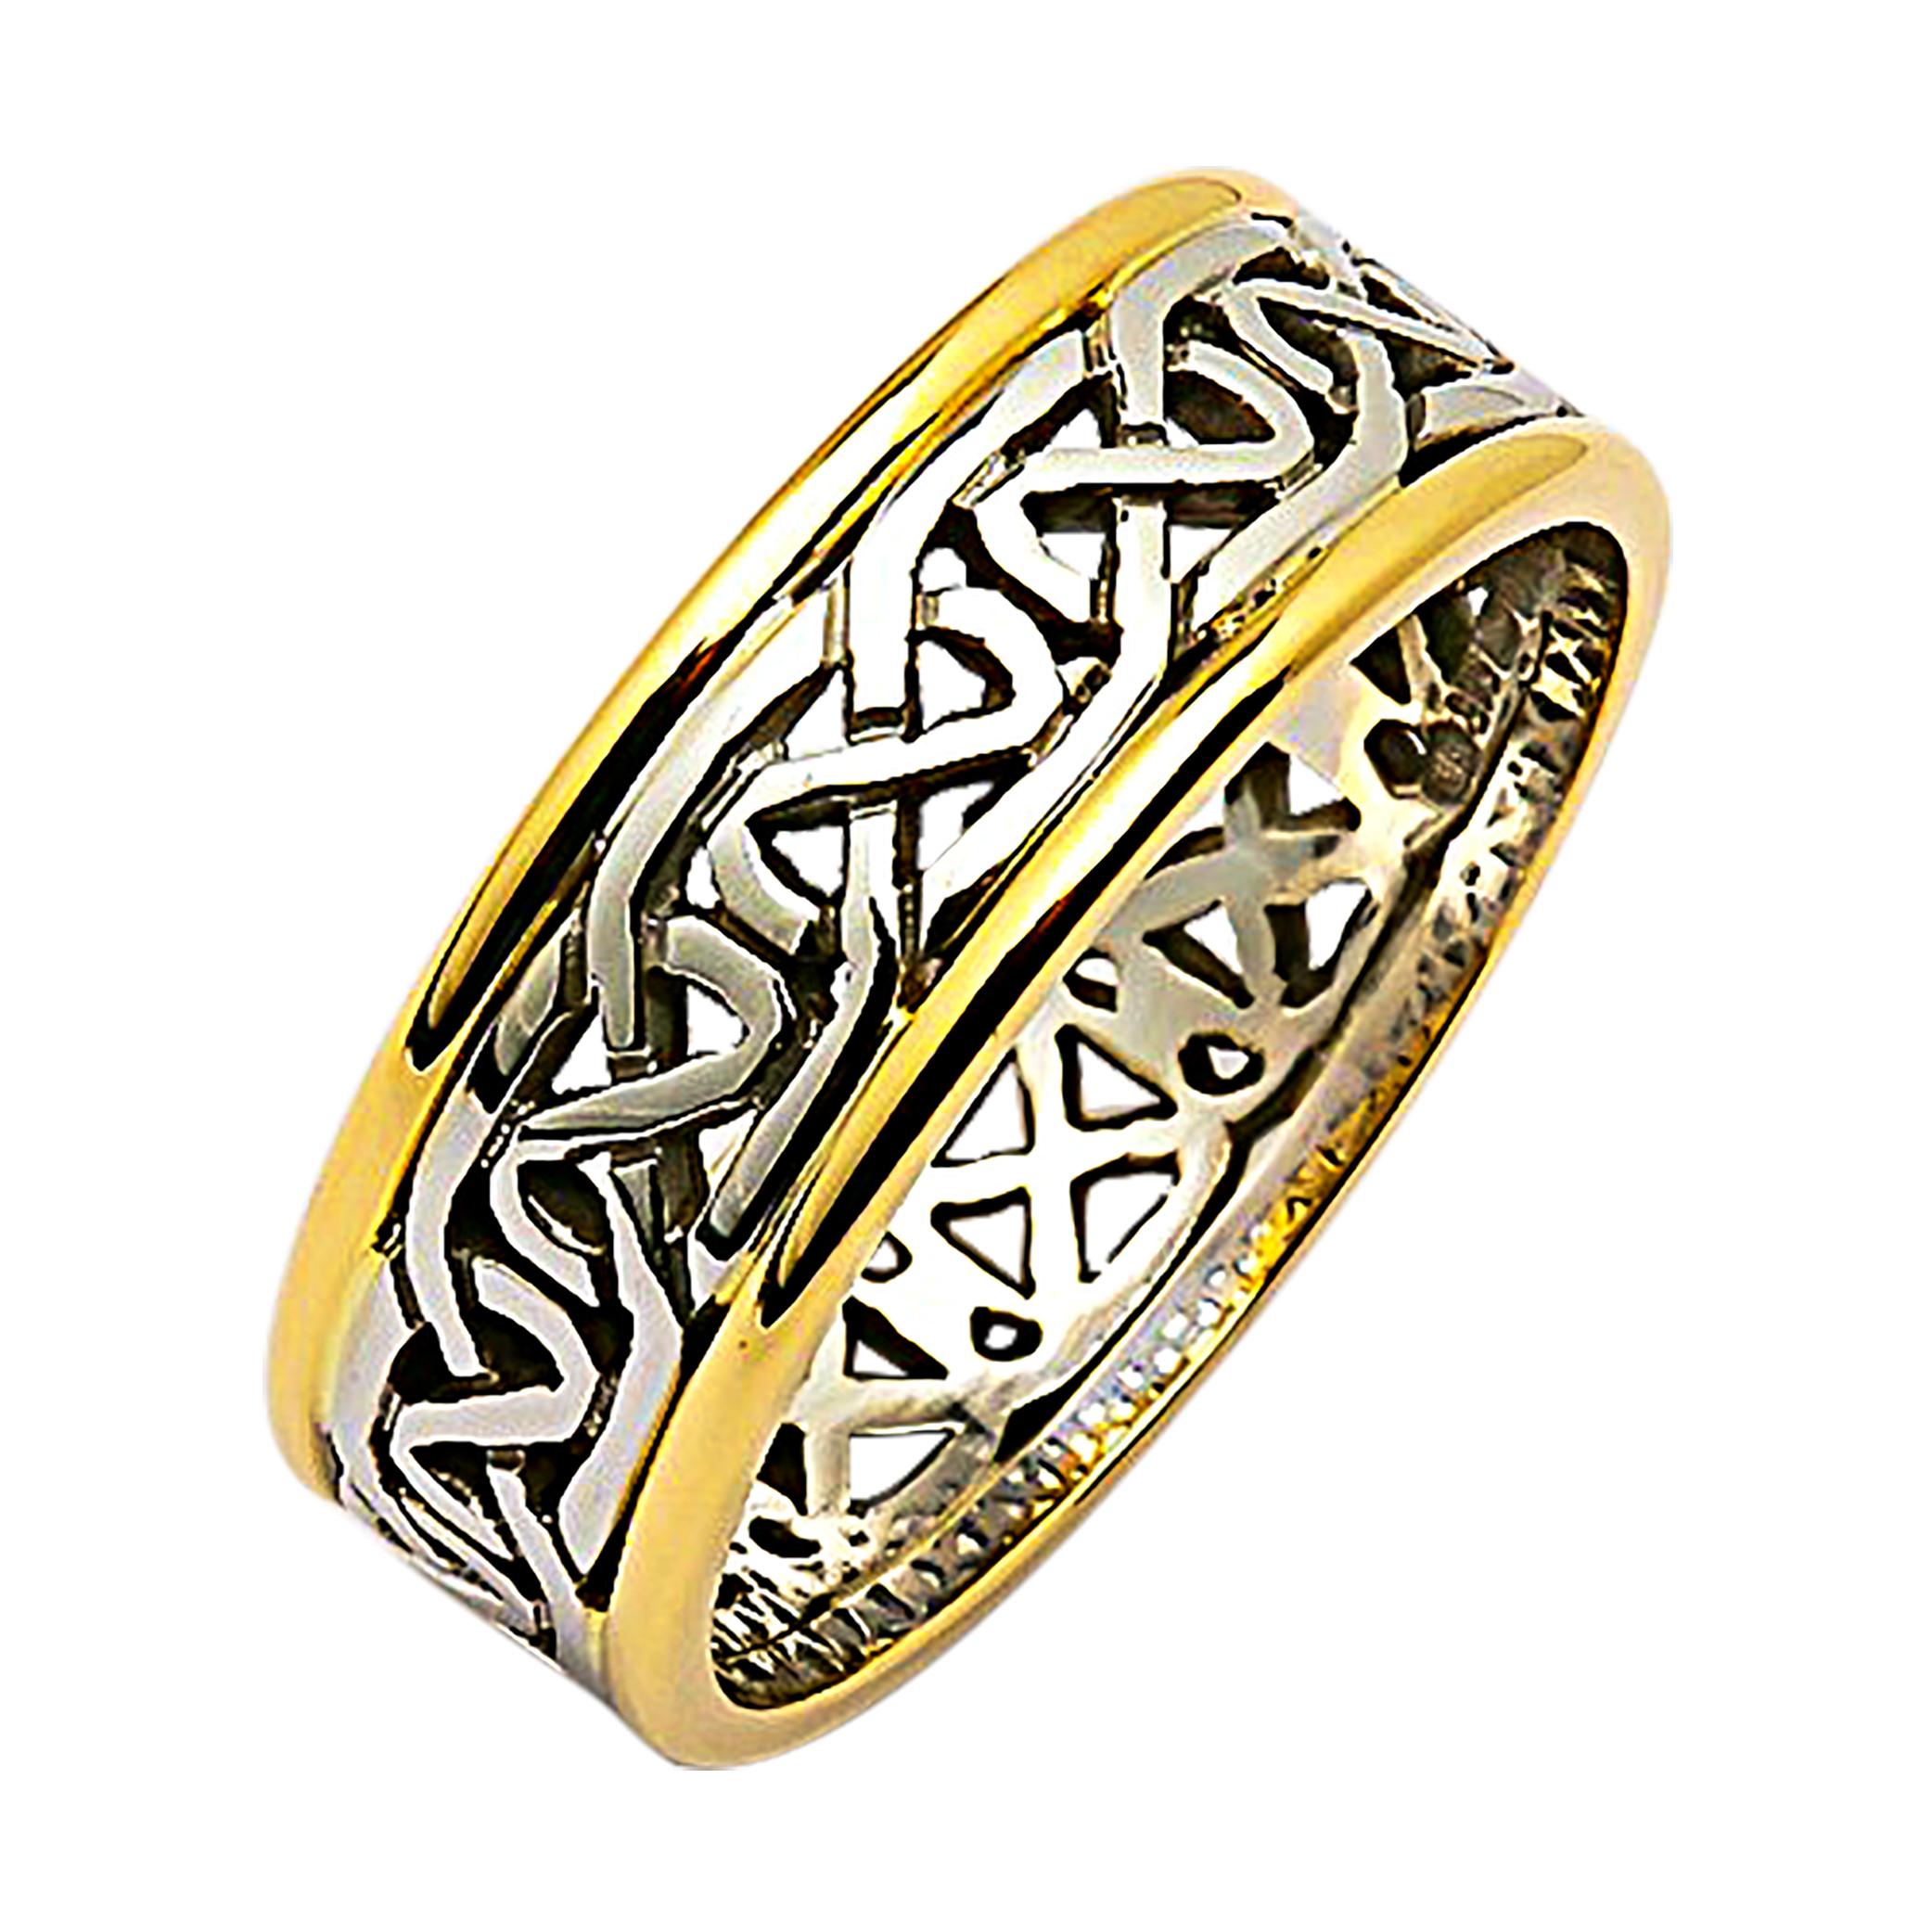 Irish Two Tone Wedding Ring Celtic Knots 14 Karat or 18 Karat Gold